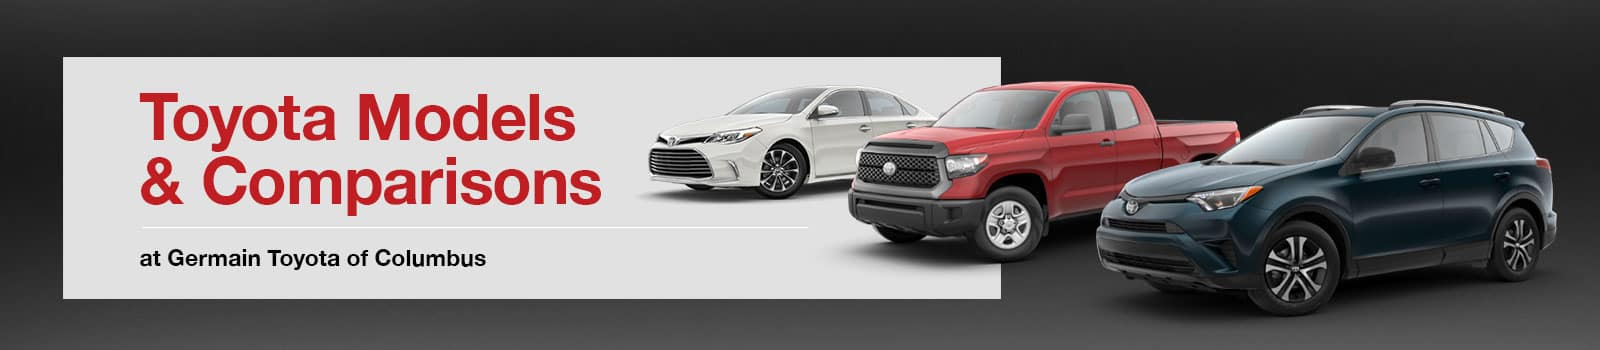 Toyota Models & Comparisons at Germain Toyota of Columbus